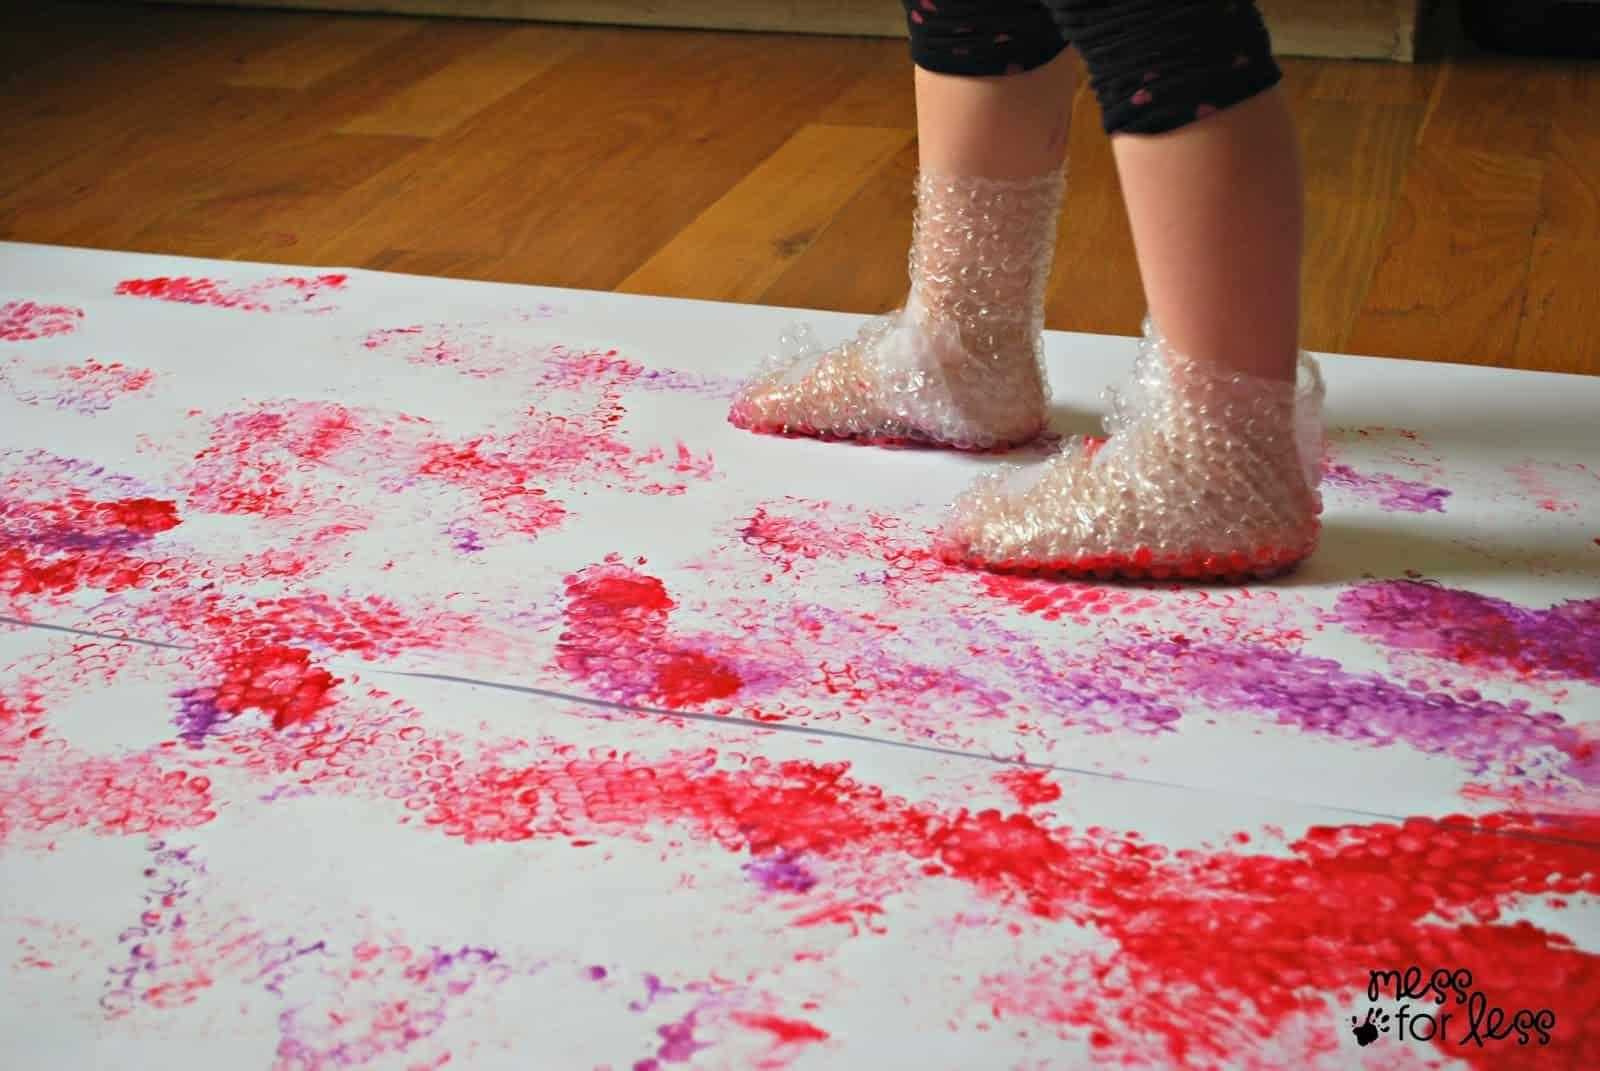 painted foot prints